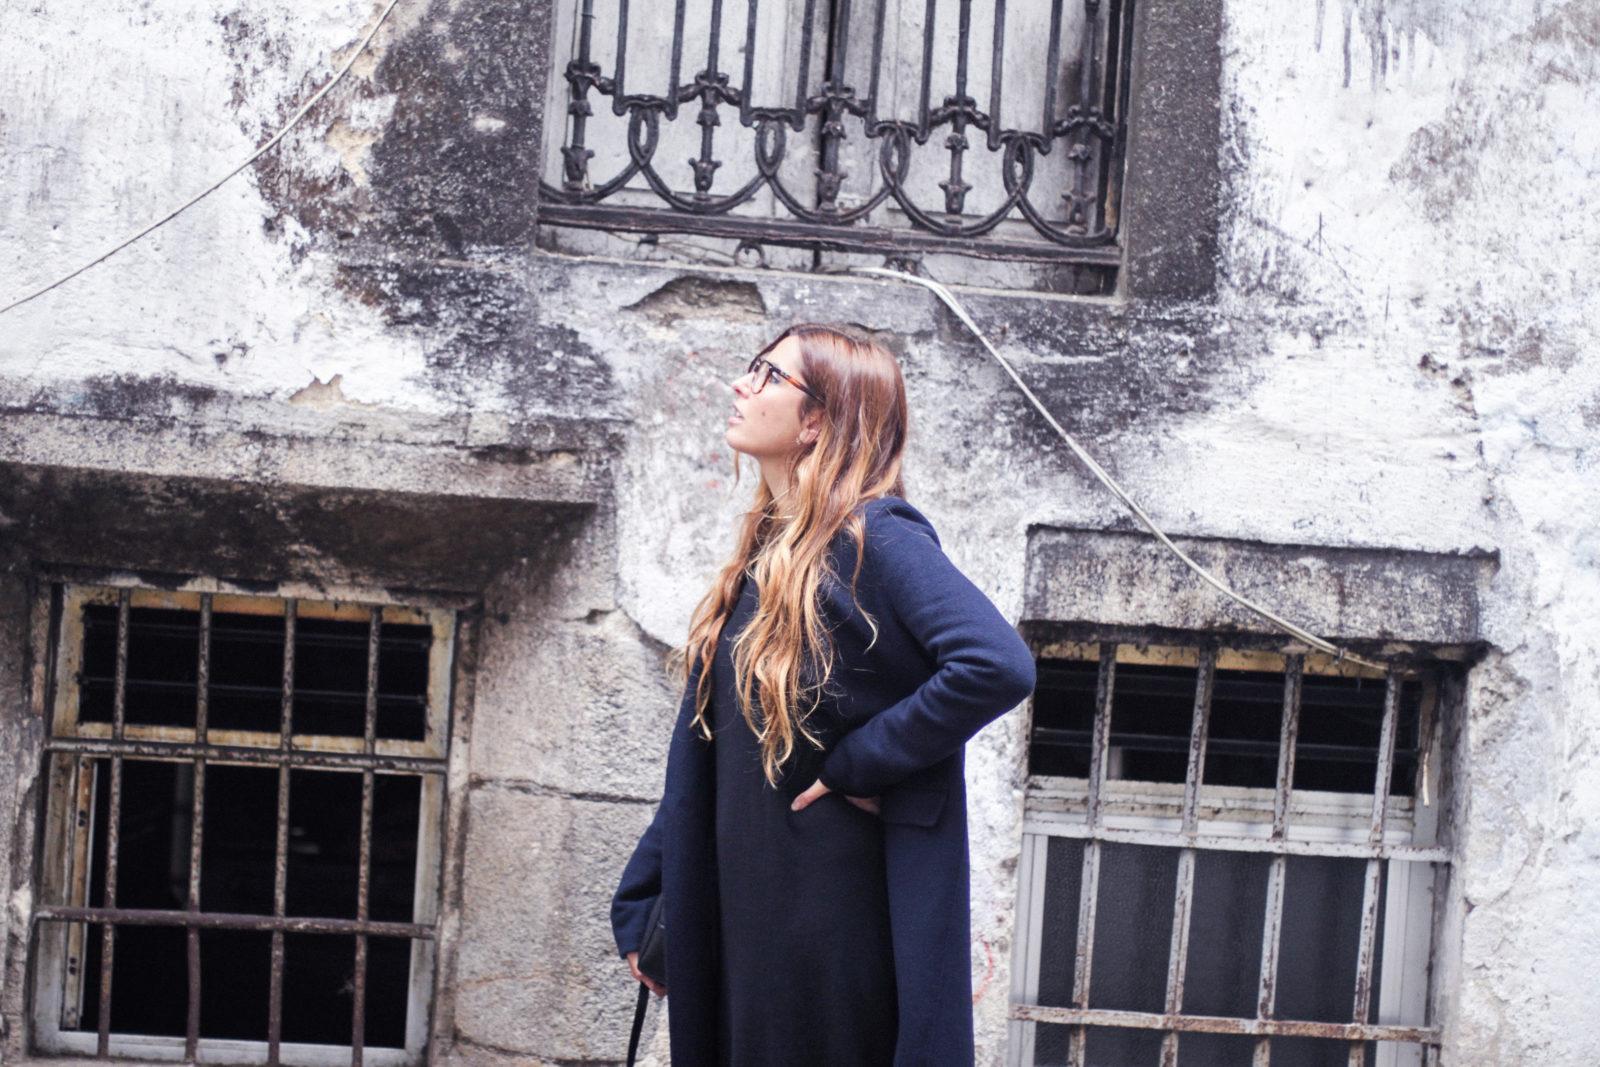 vestido_de_punto_midi_vans_calcetines_rejilla_choker_metalico_happiness_boutique_abrigo_largo_gucci_street_style_fall_2016_donkeycool-11